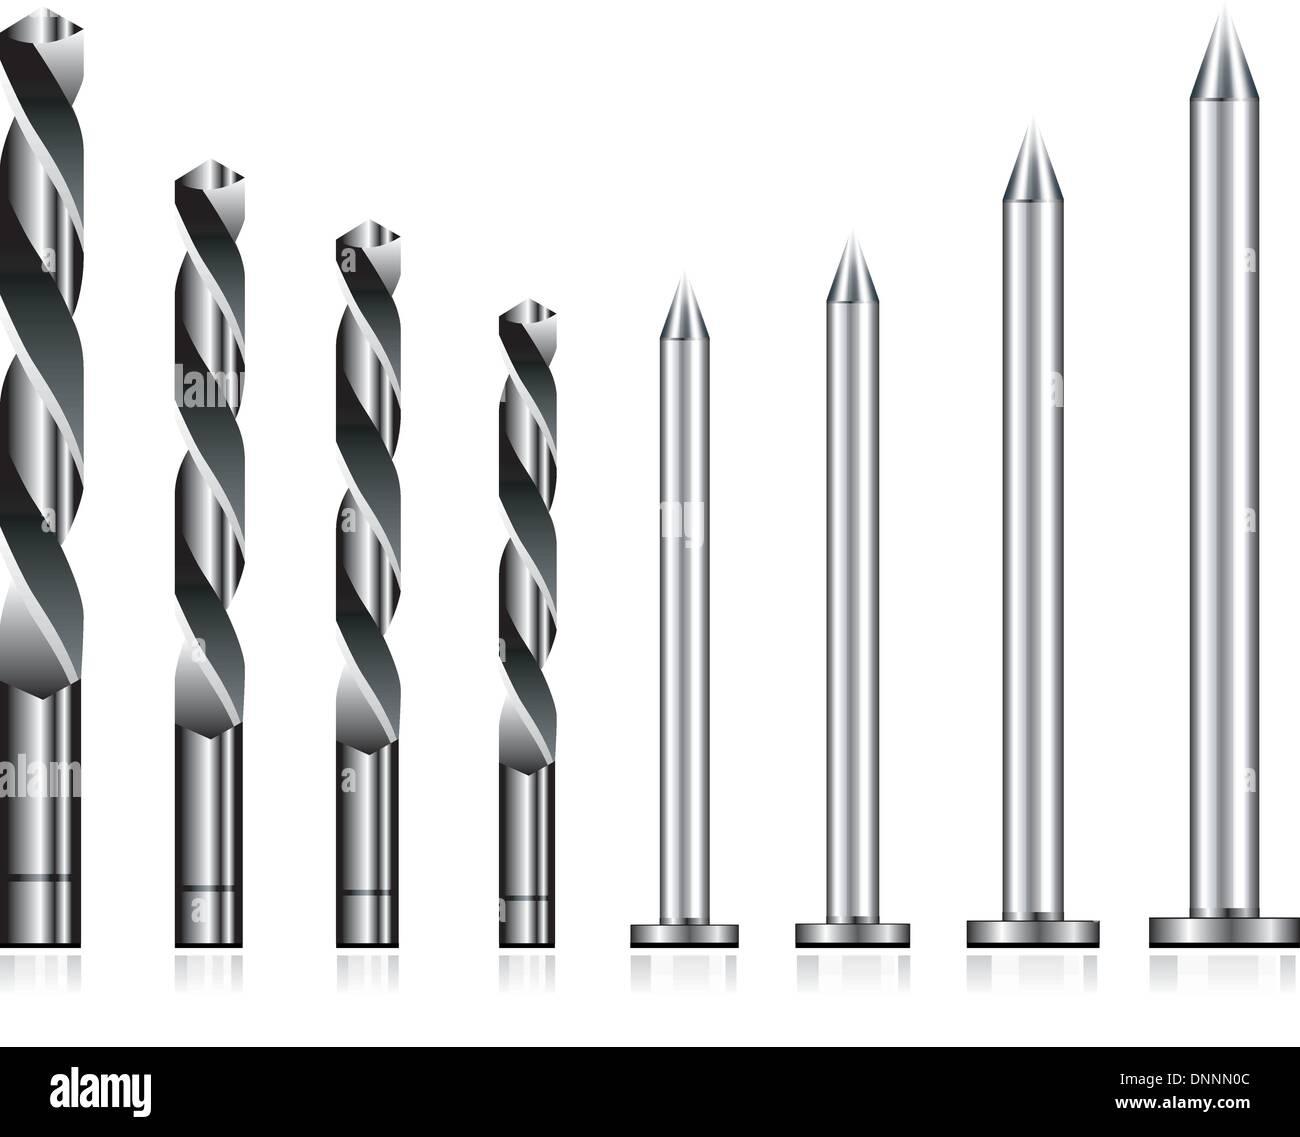 Realistische Bohrer und Stahl Nagel set Stockbild